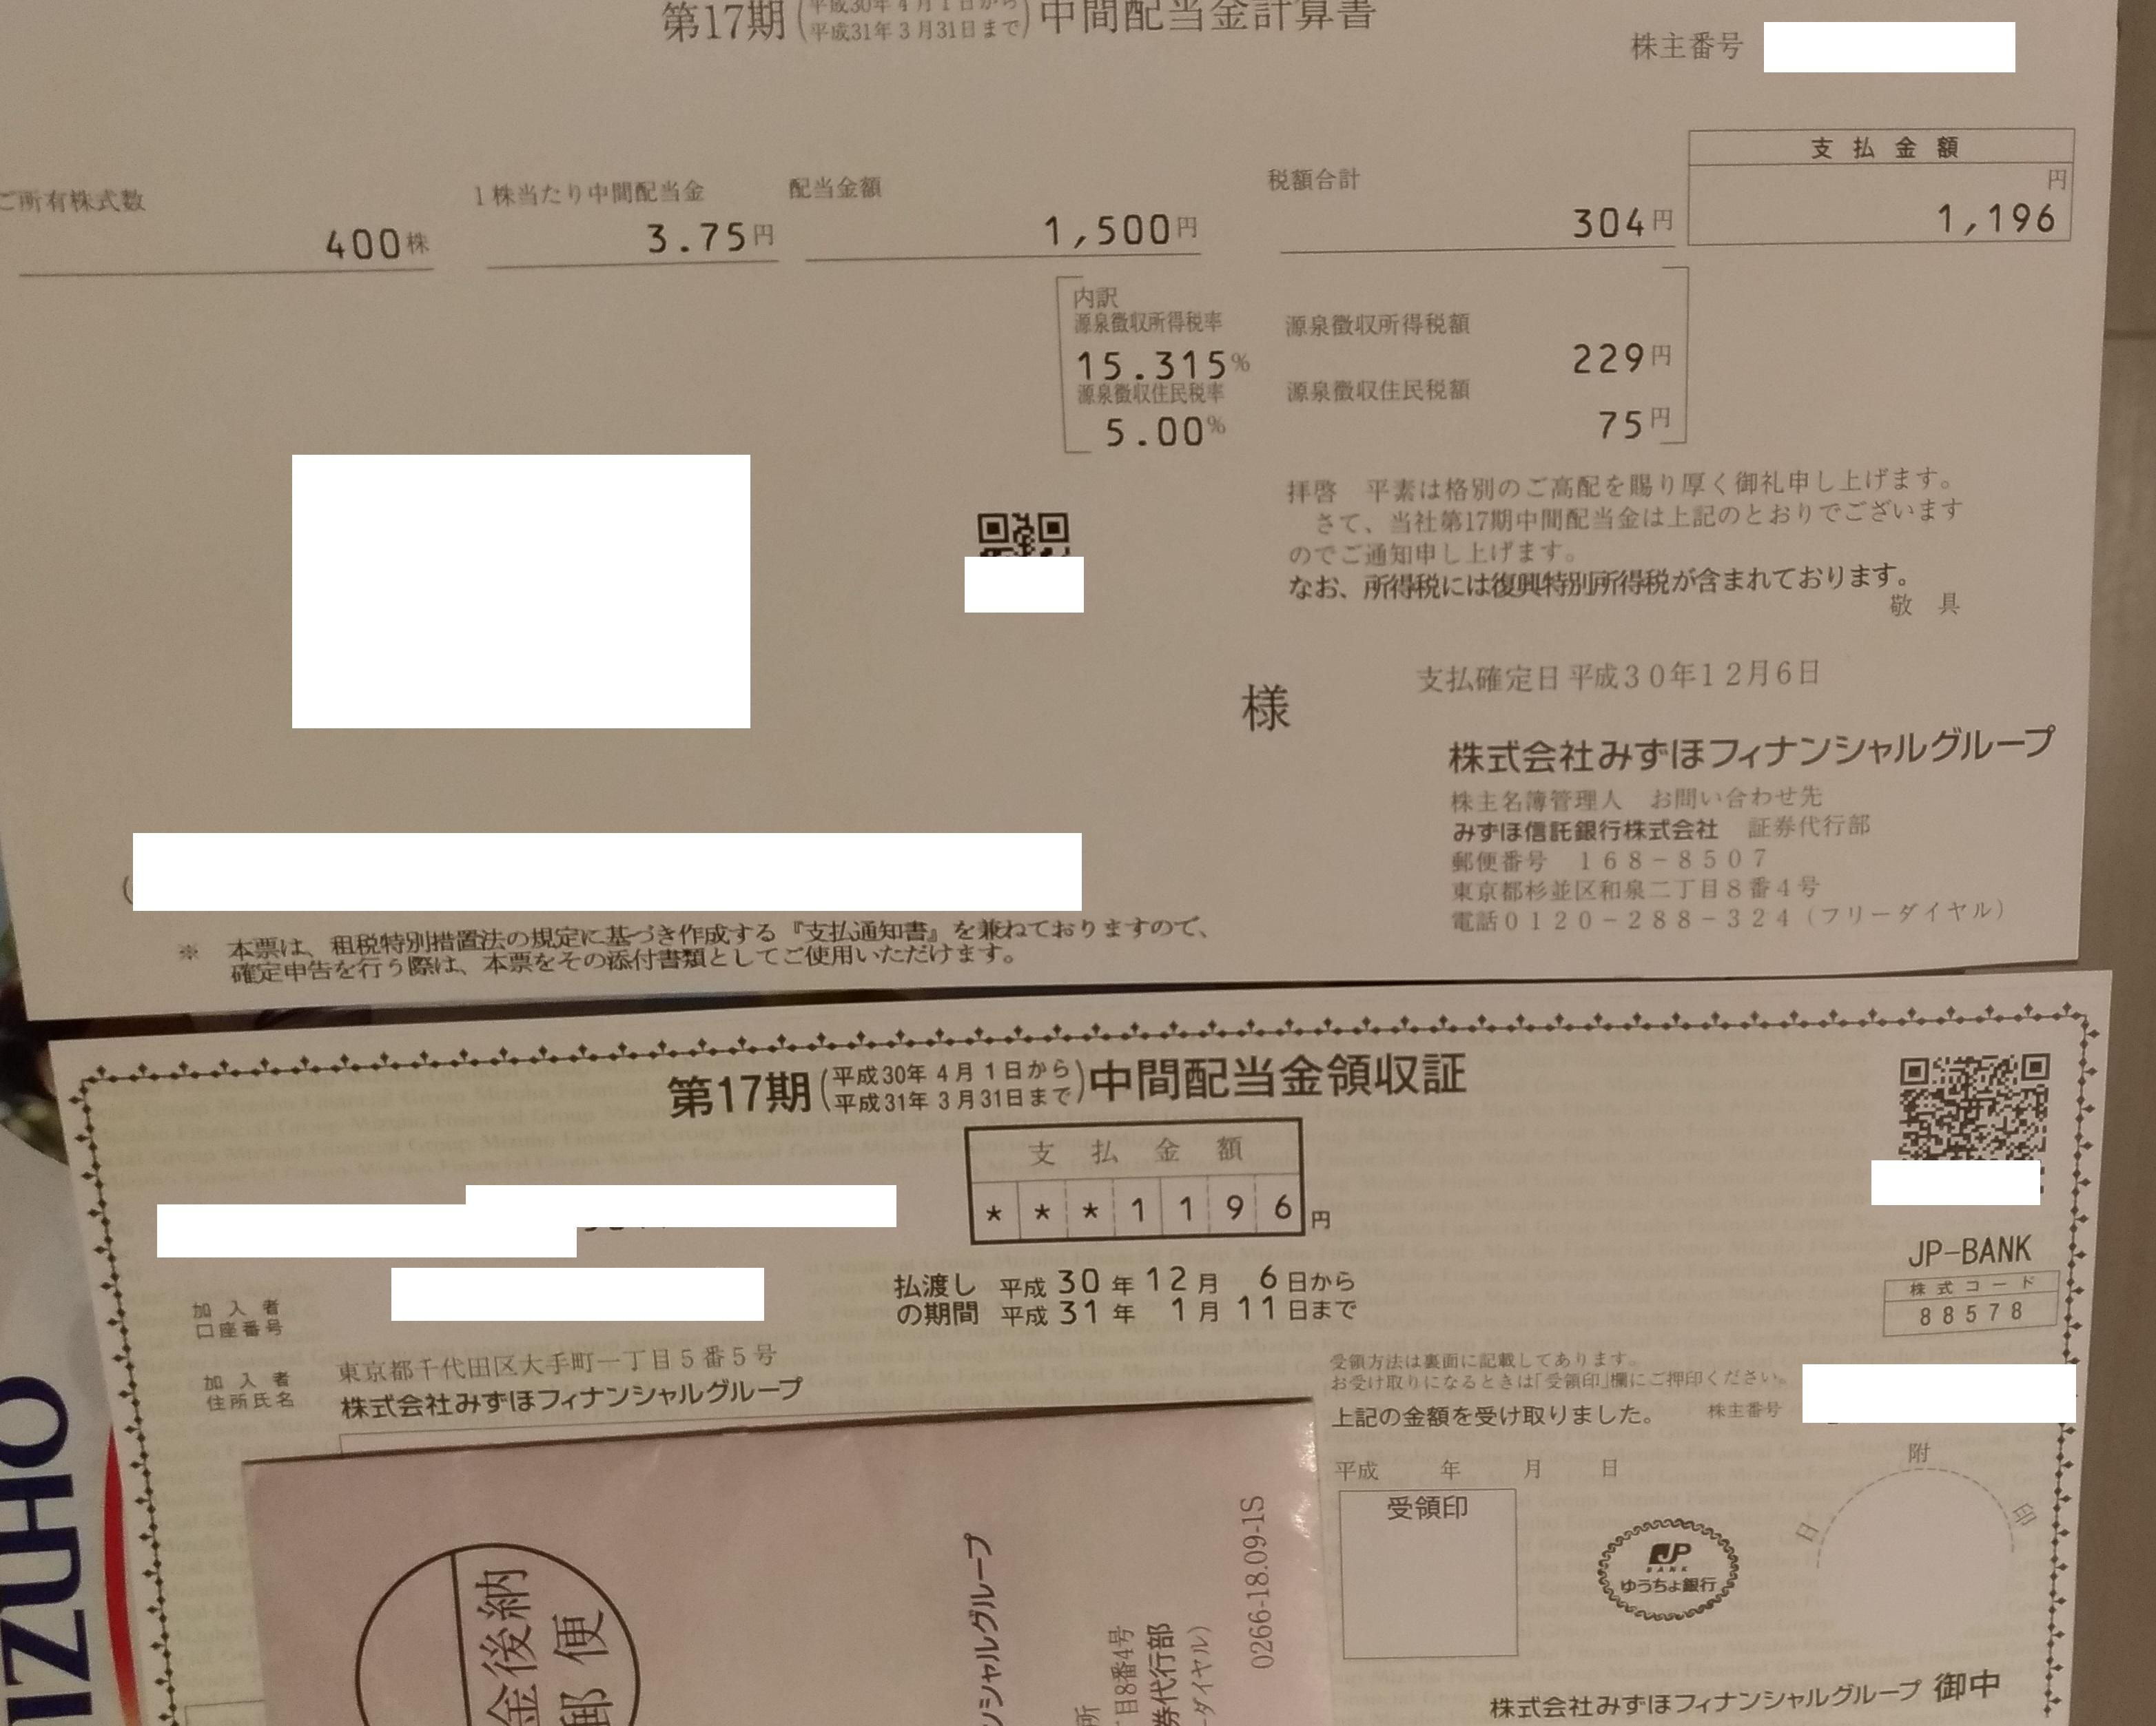 mizuho_haito_hitokabu_atari_201812.jpg